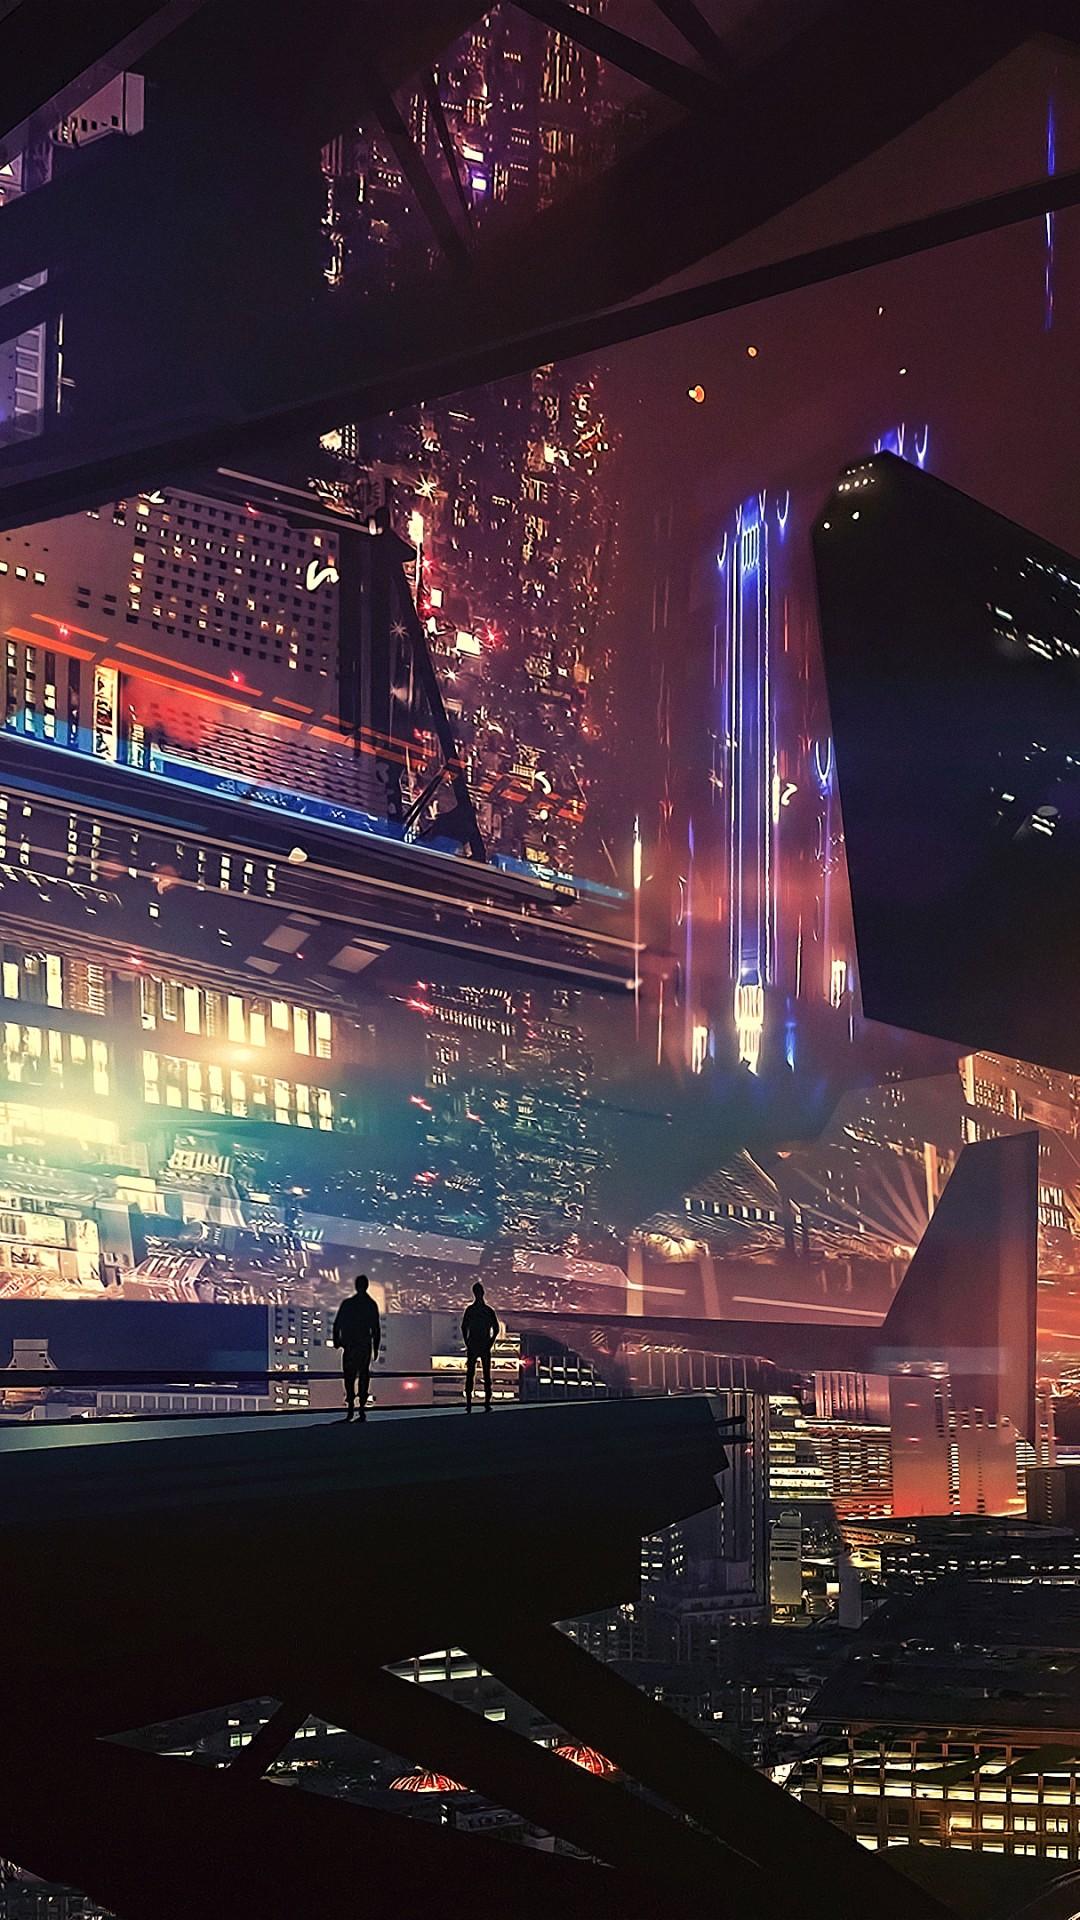 Wallpaper Spaceship Future World Cyberpunk Futuristic